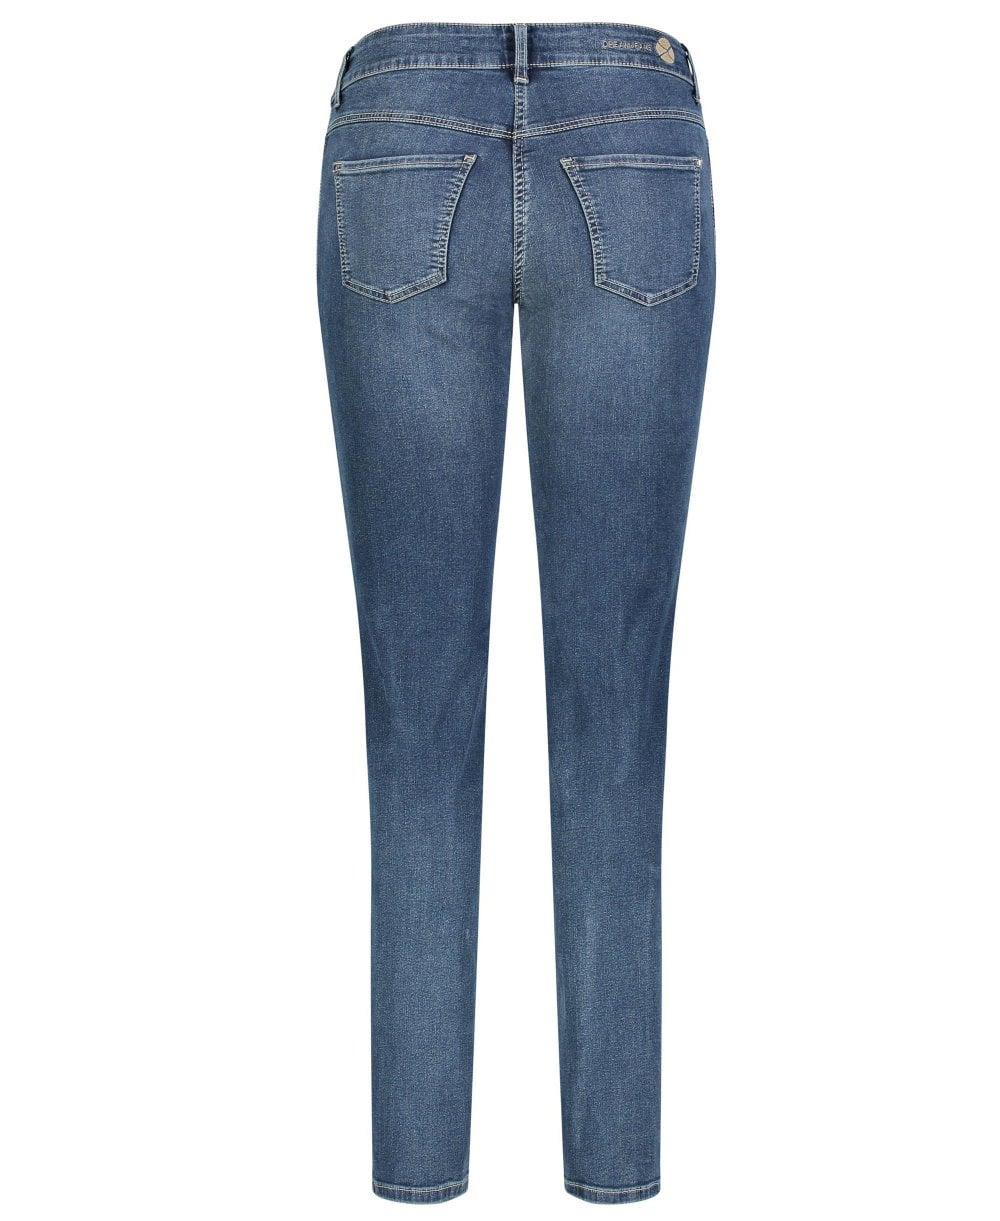 c85a9ebd45e9da MAC Dream Straight Leg Jean - Jeans from luxury-legs.com UK